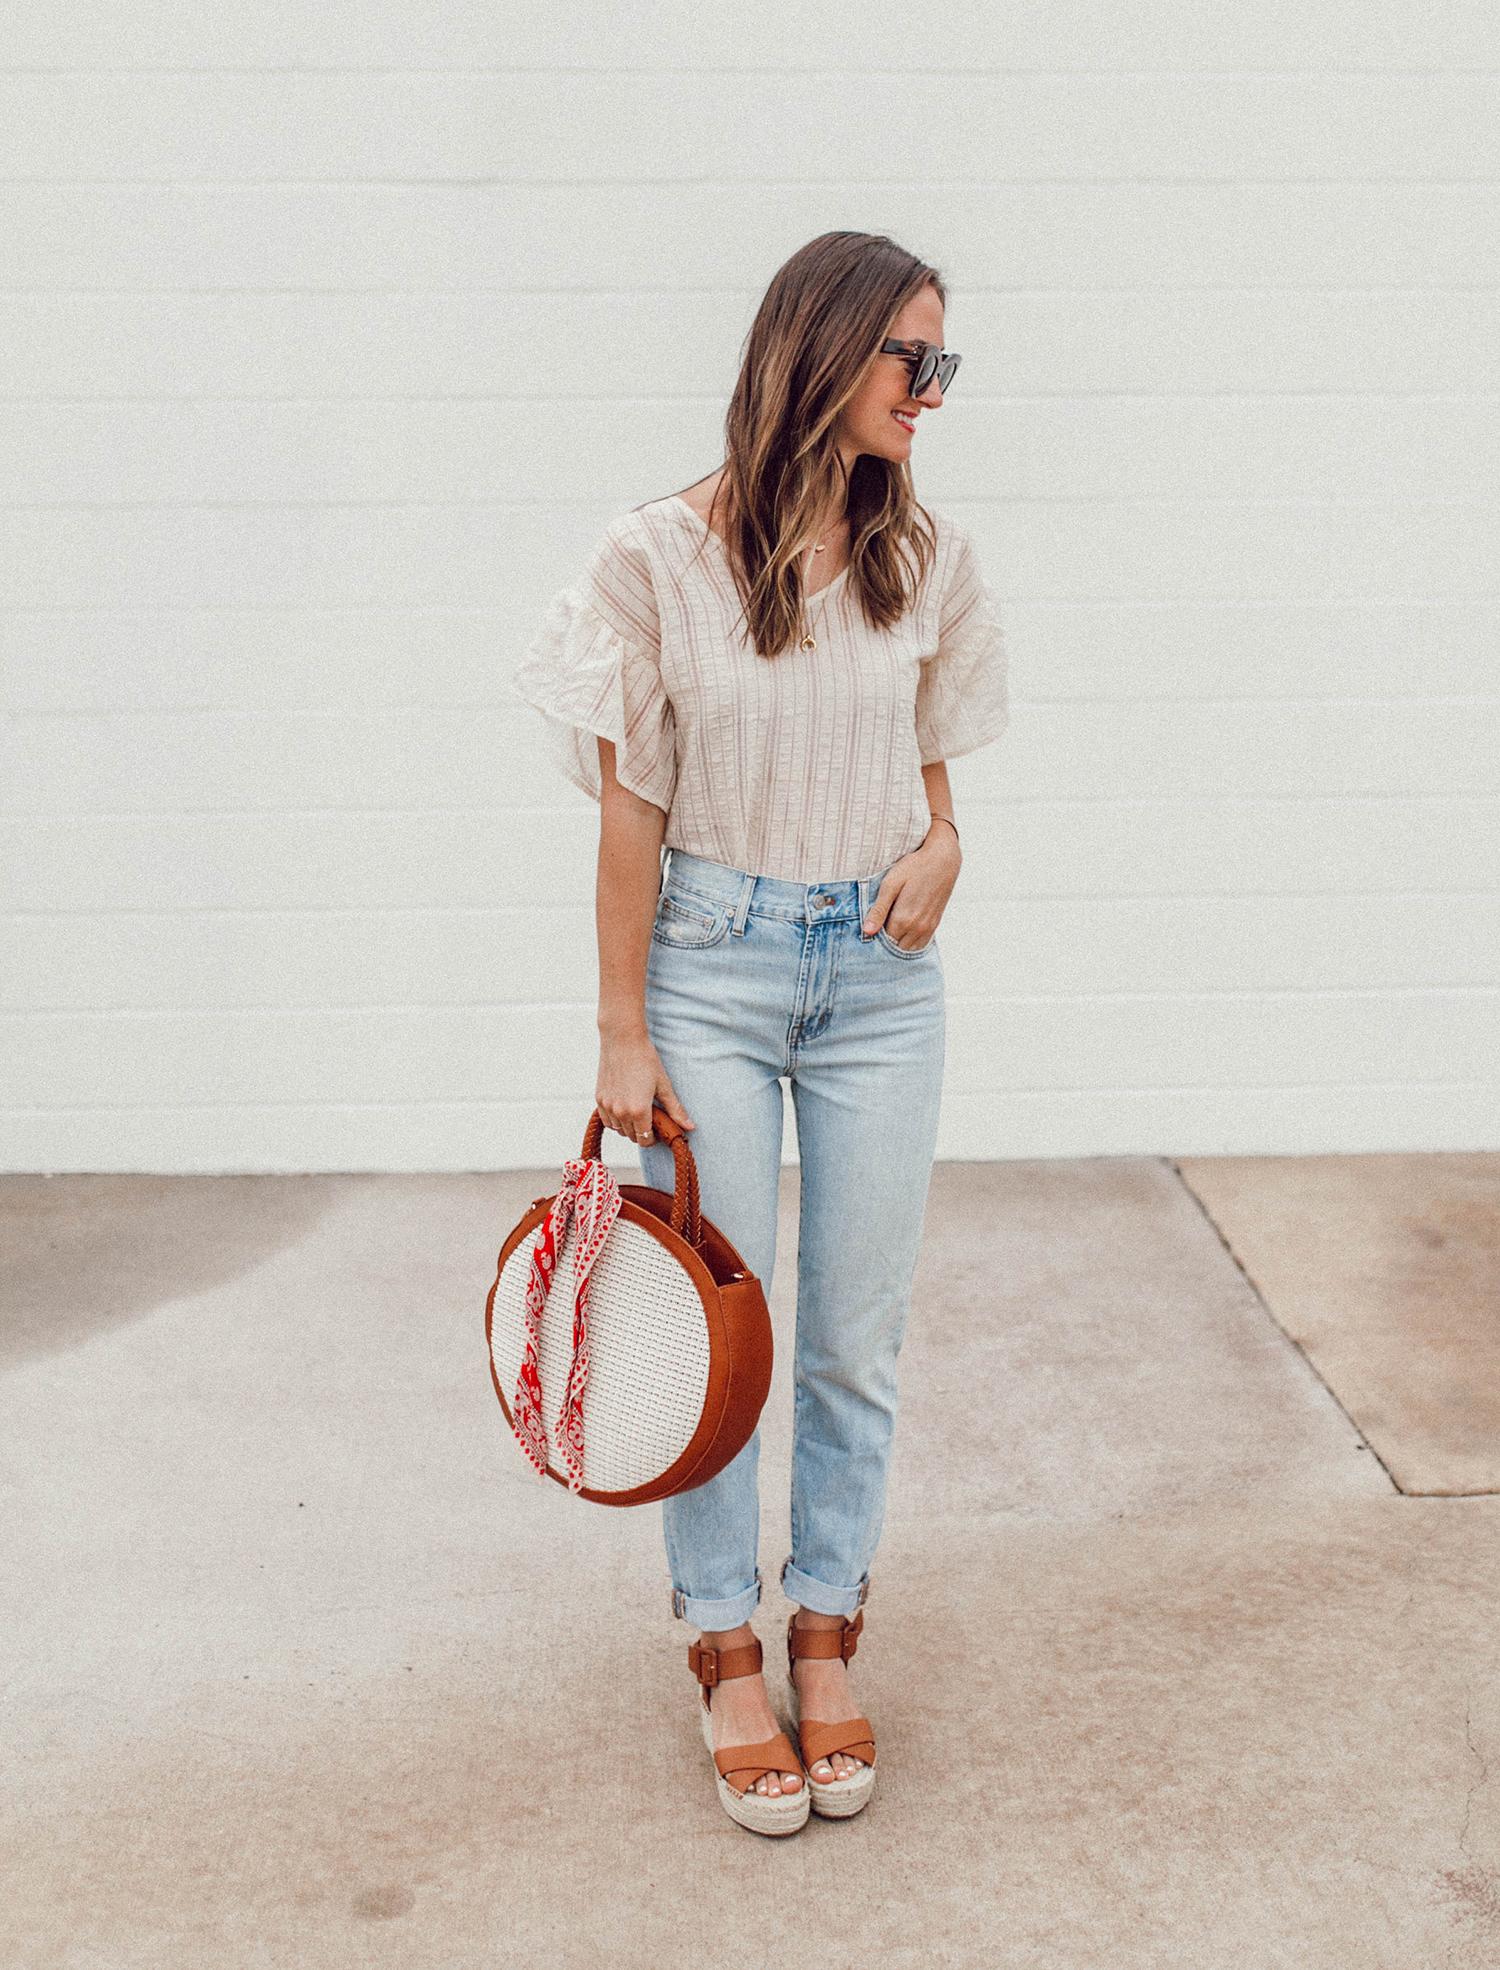 livvyland-blog-olivia-watson-sole-society-espadrille-wedges-round-straw-handbag-5